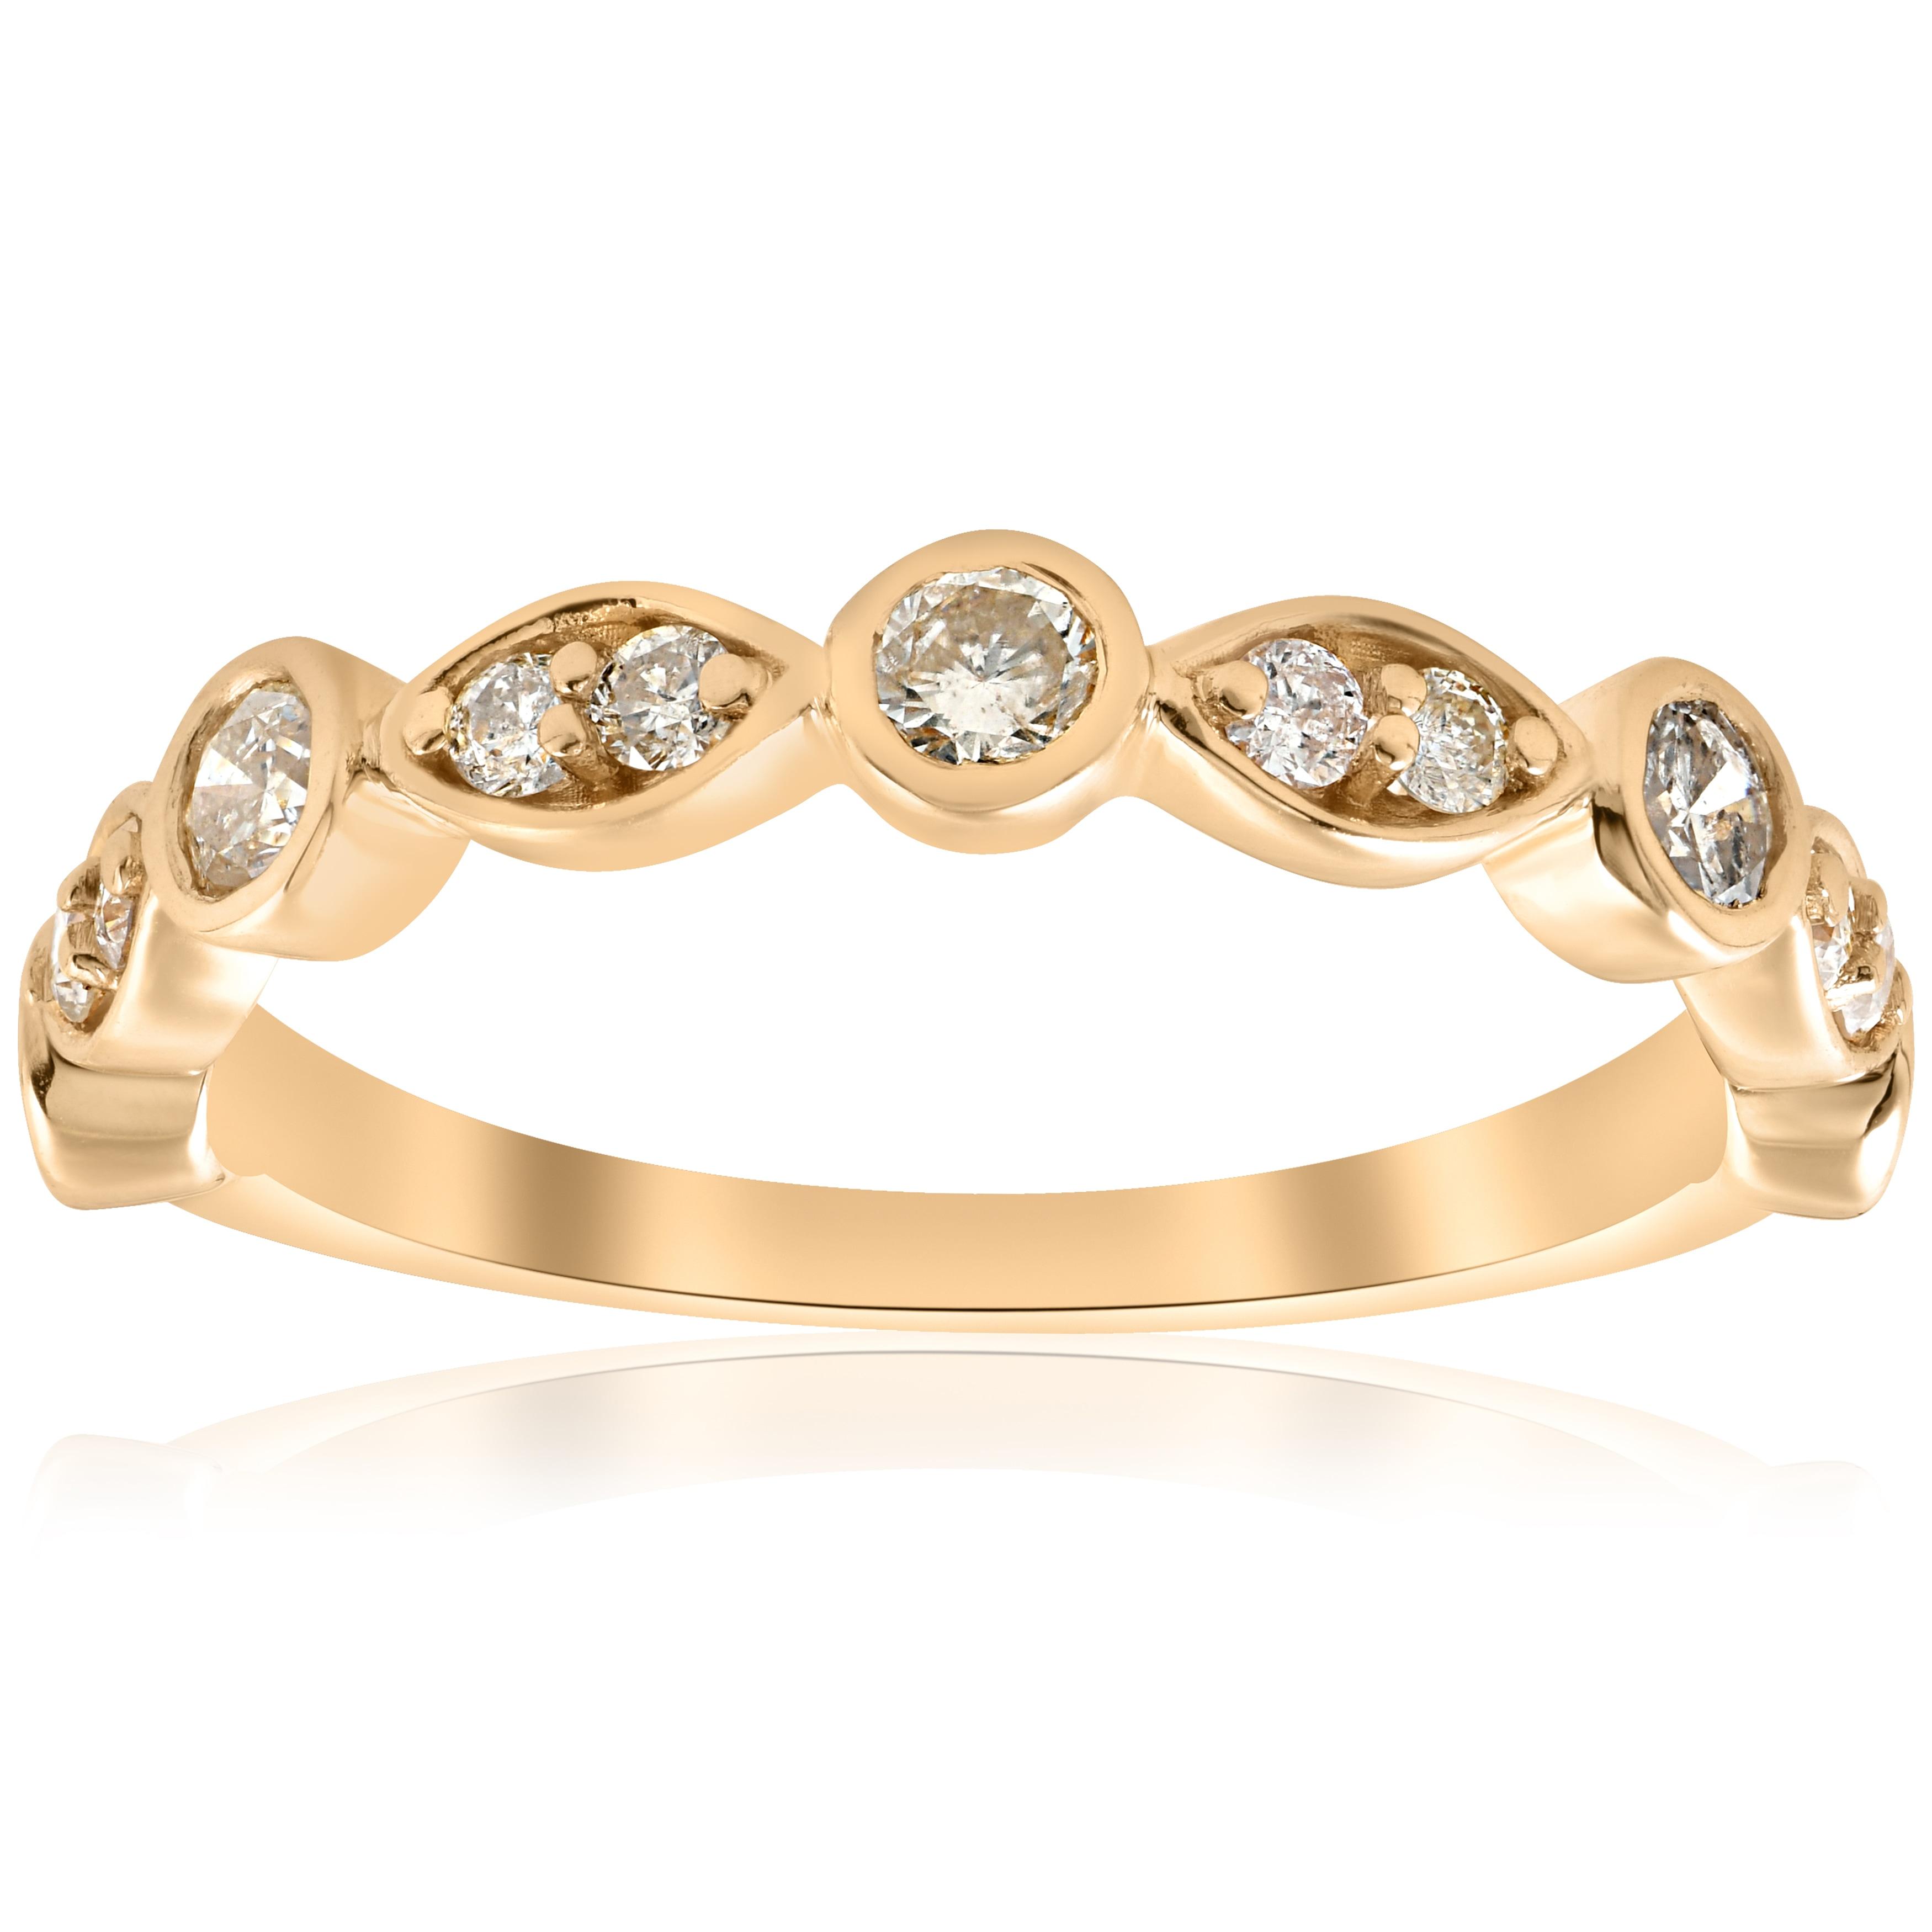 Shop 14k Yellow Gold 1/2 ct TDW Diamond Wedding Ring Stackable Bezel ...